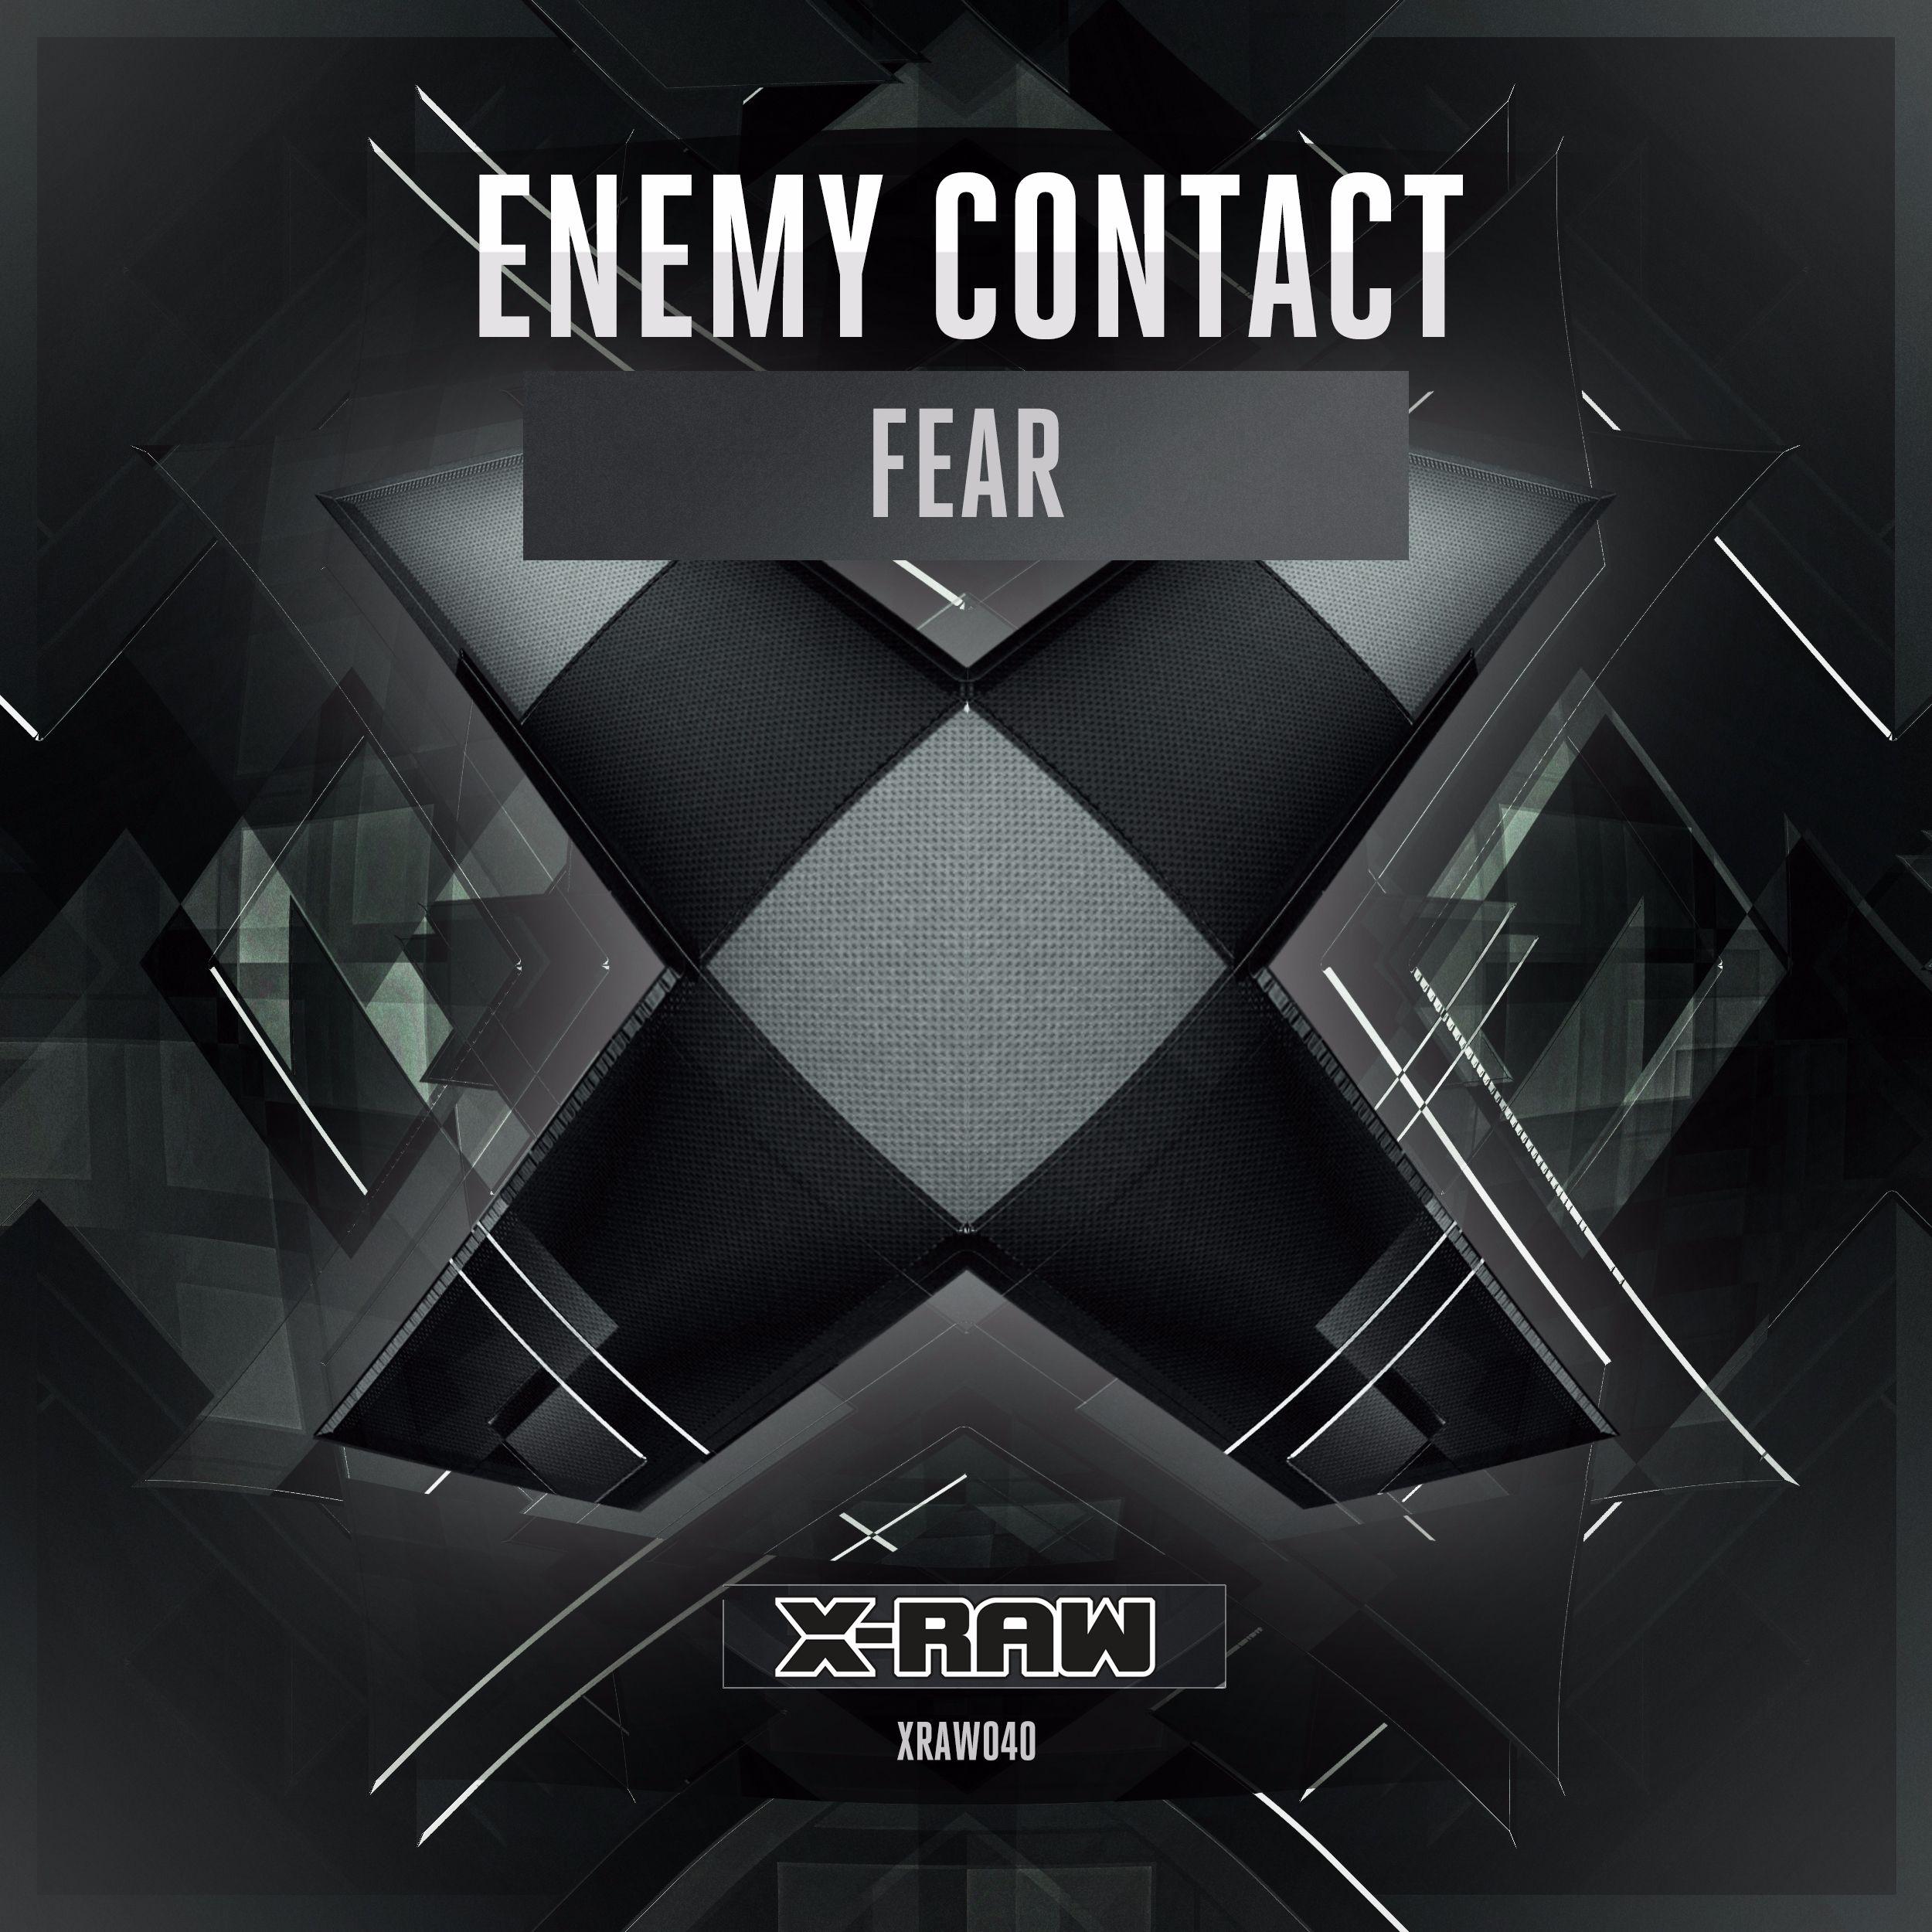 Enemy Contact - Fear [X-BONE RAW] XRAW040